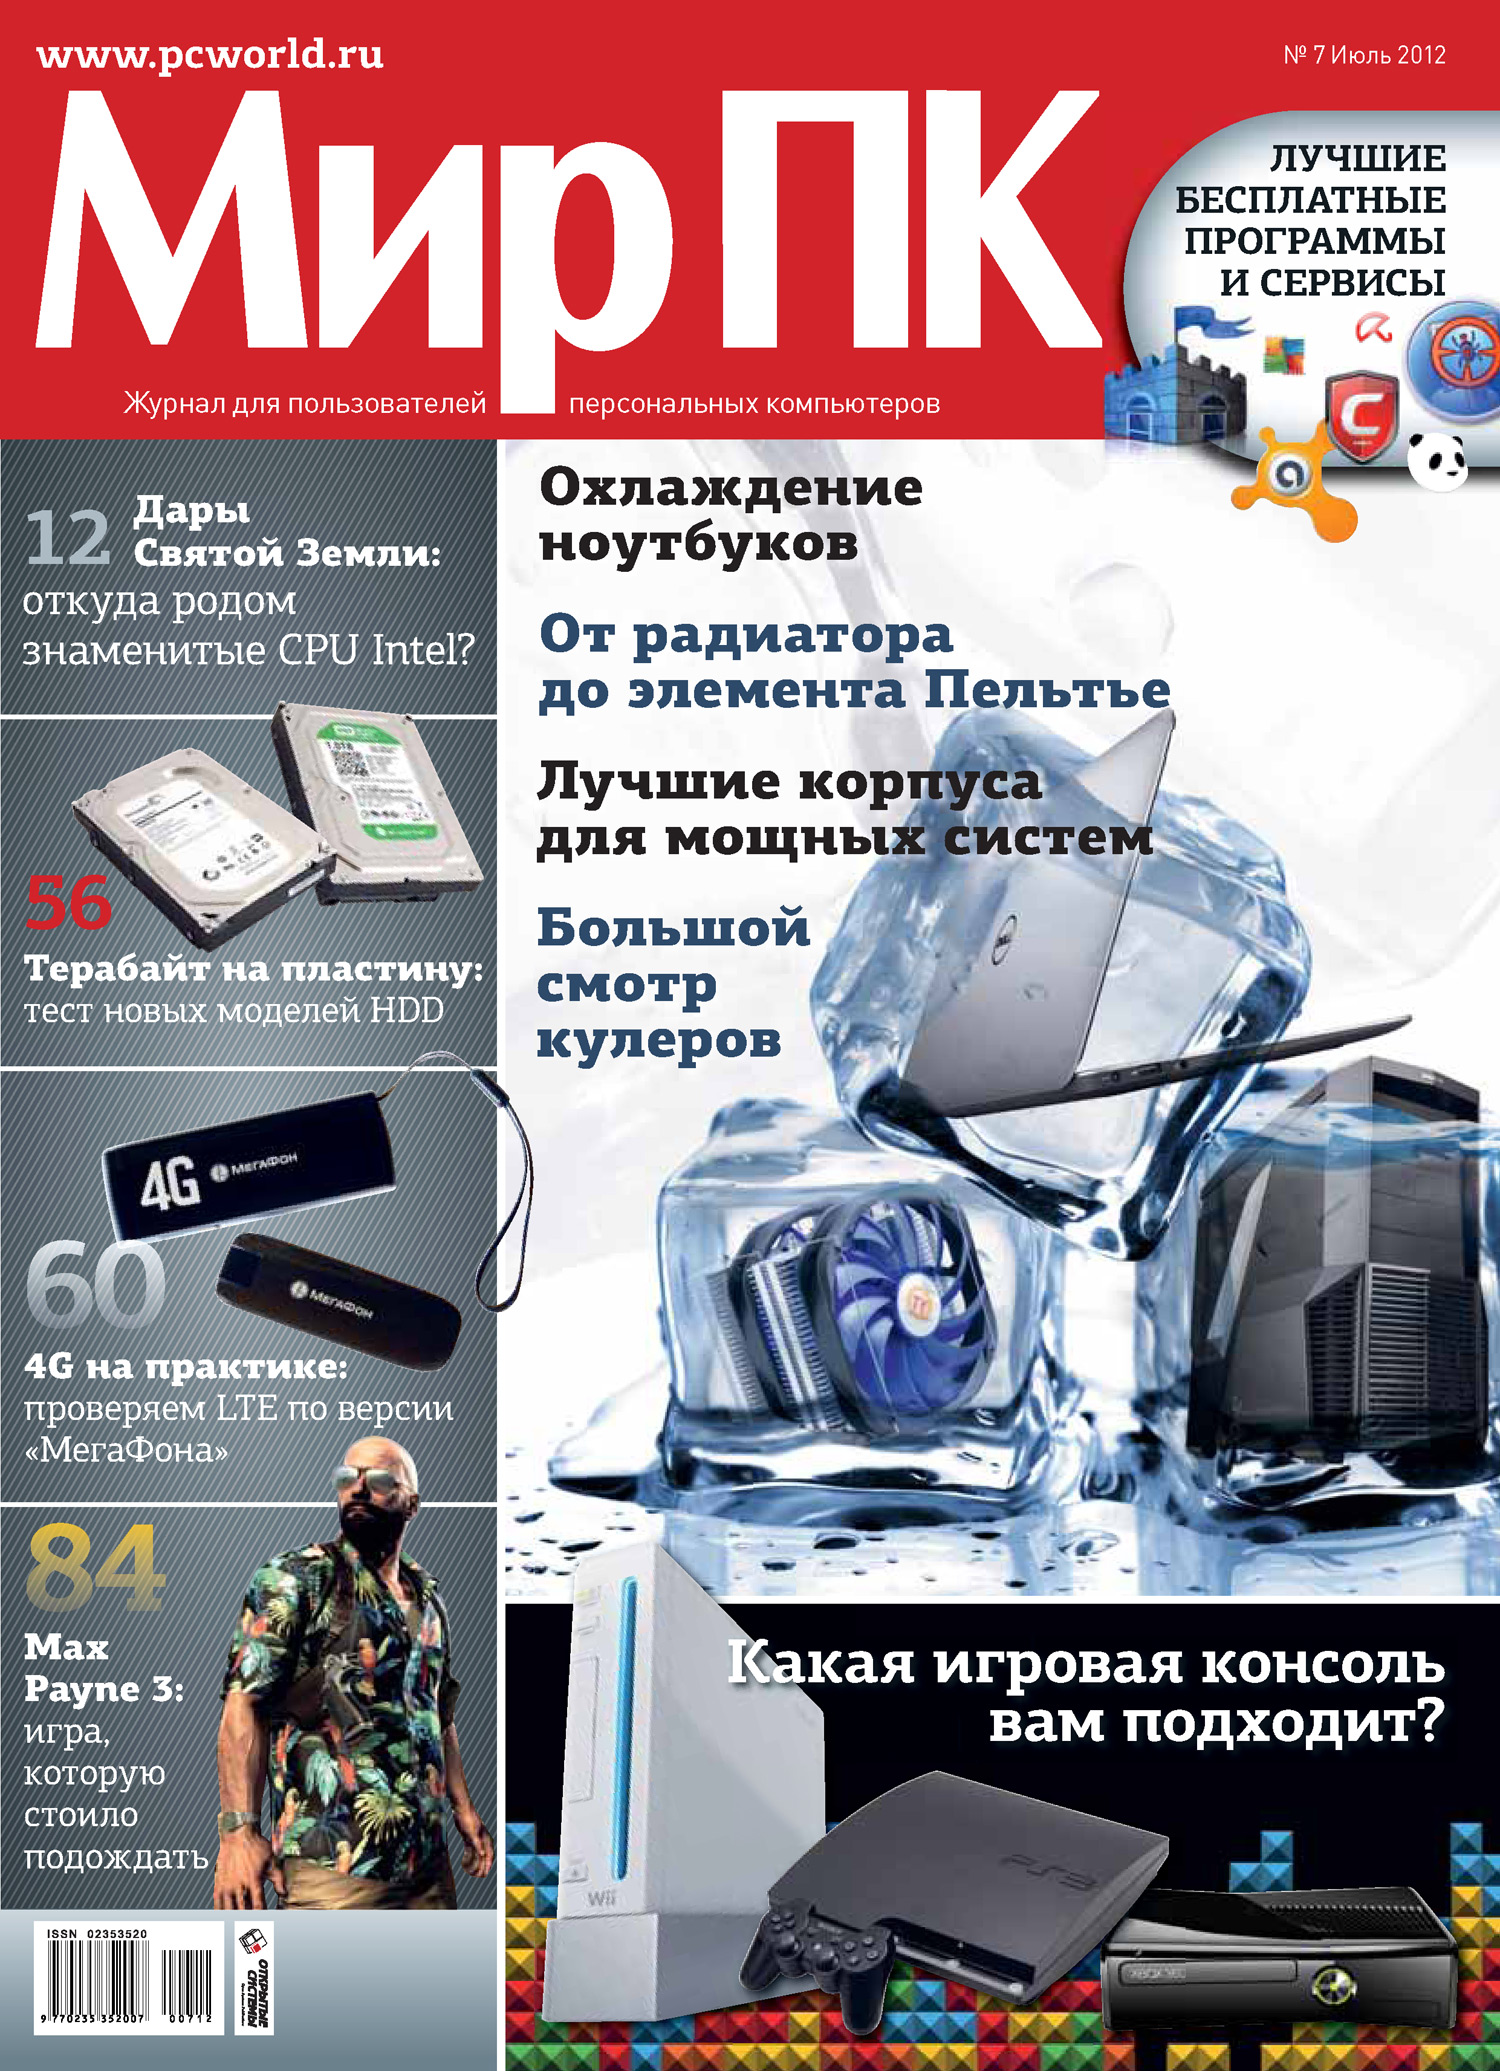 Журнал «Мир ПК» №07/2012